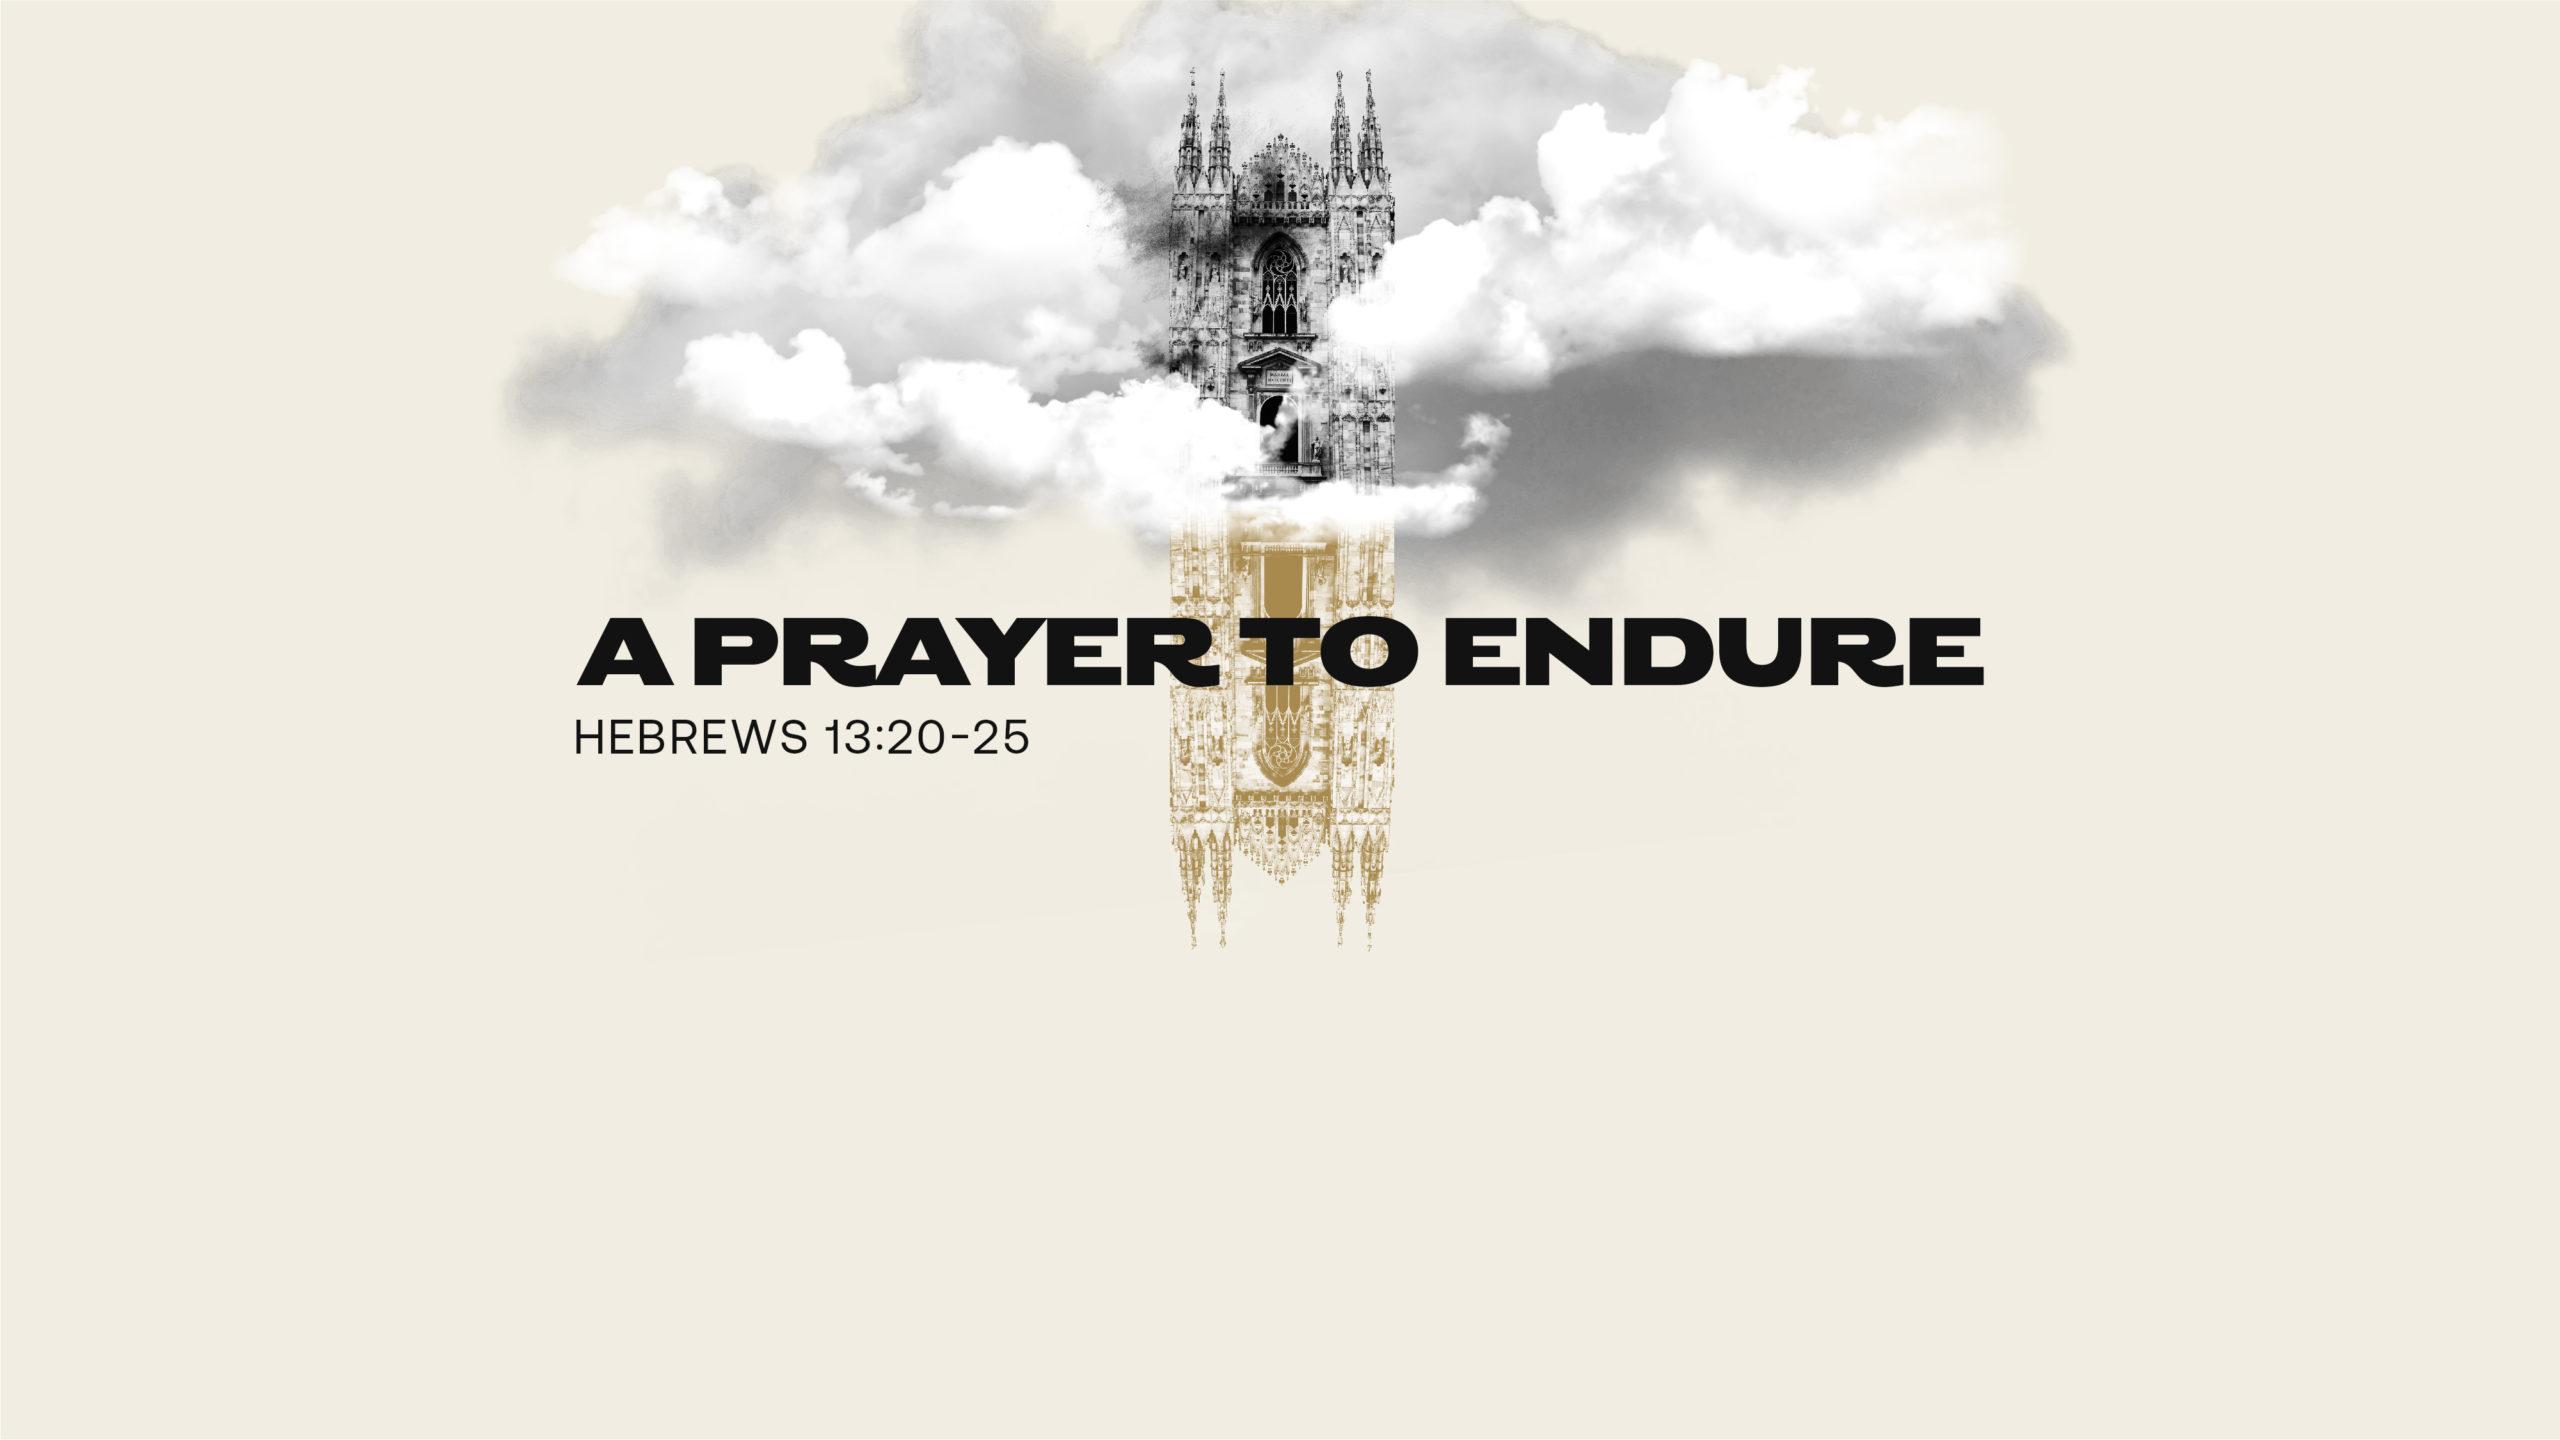 A Prayer to Endure